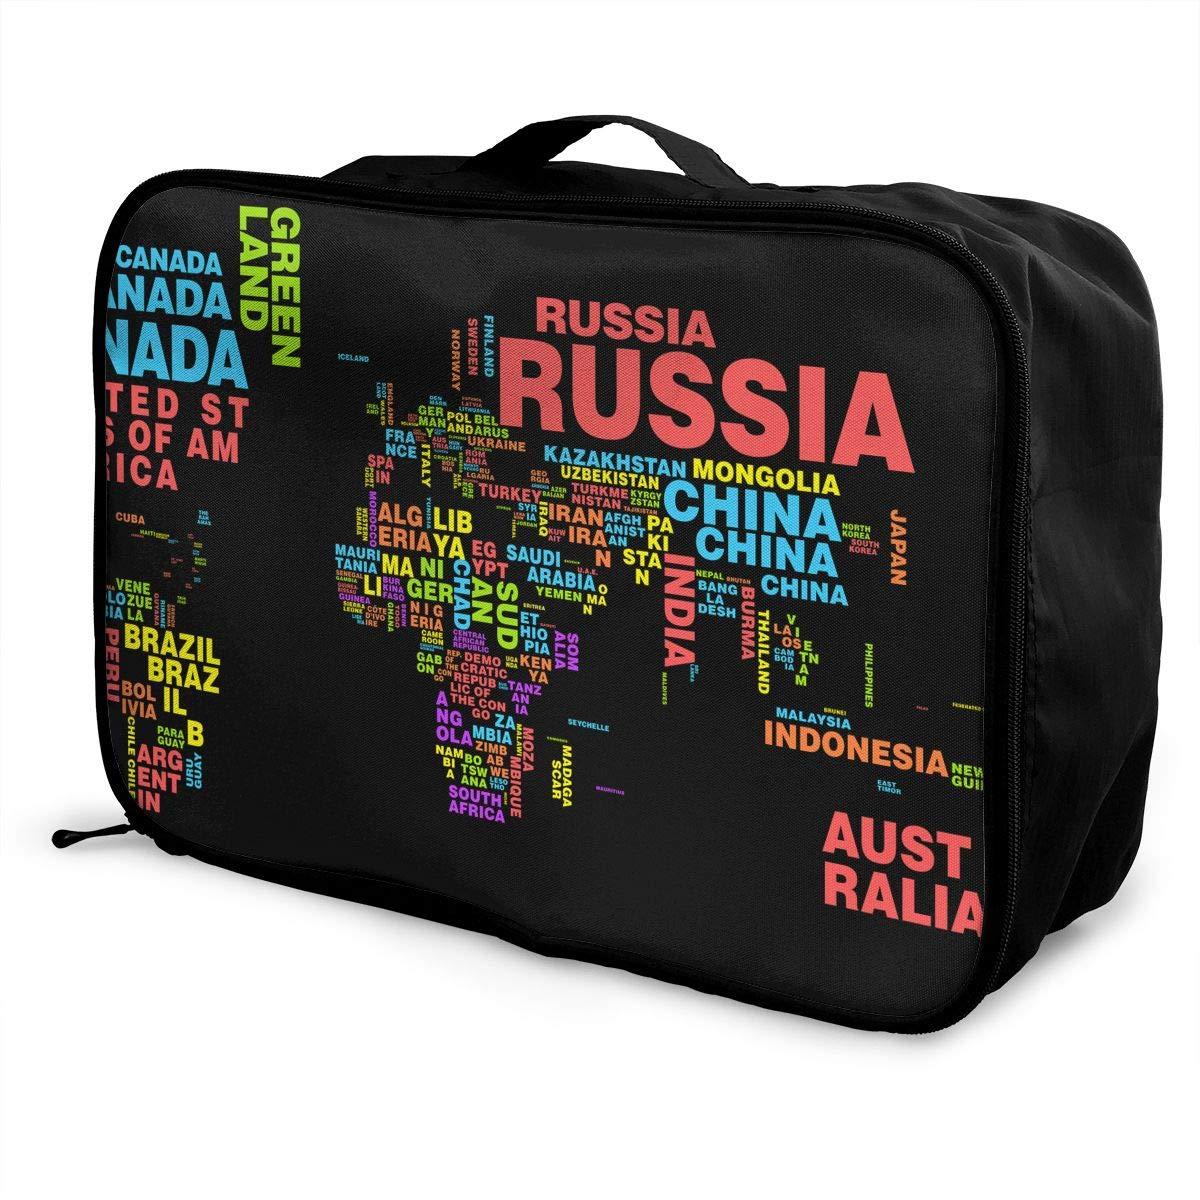 Travel Luggage Duffle Bag Lightweight Portable Handbag Vintage World Map Large Capacity Waterproof Foldable Storage Tote